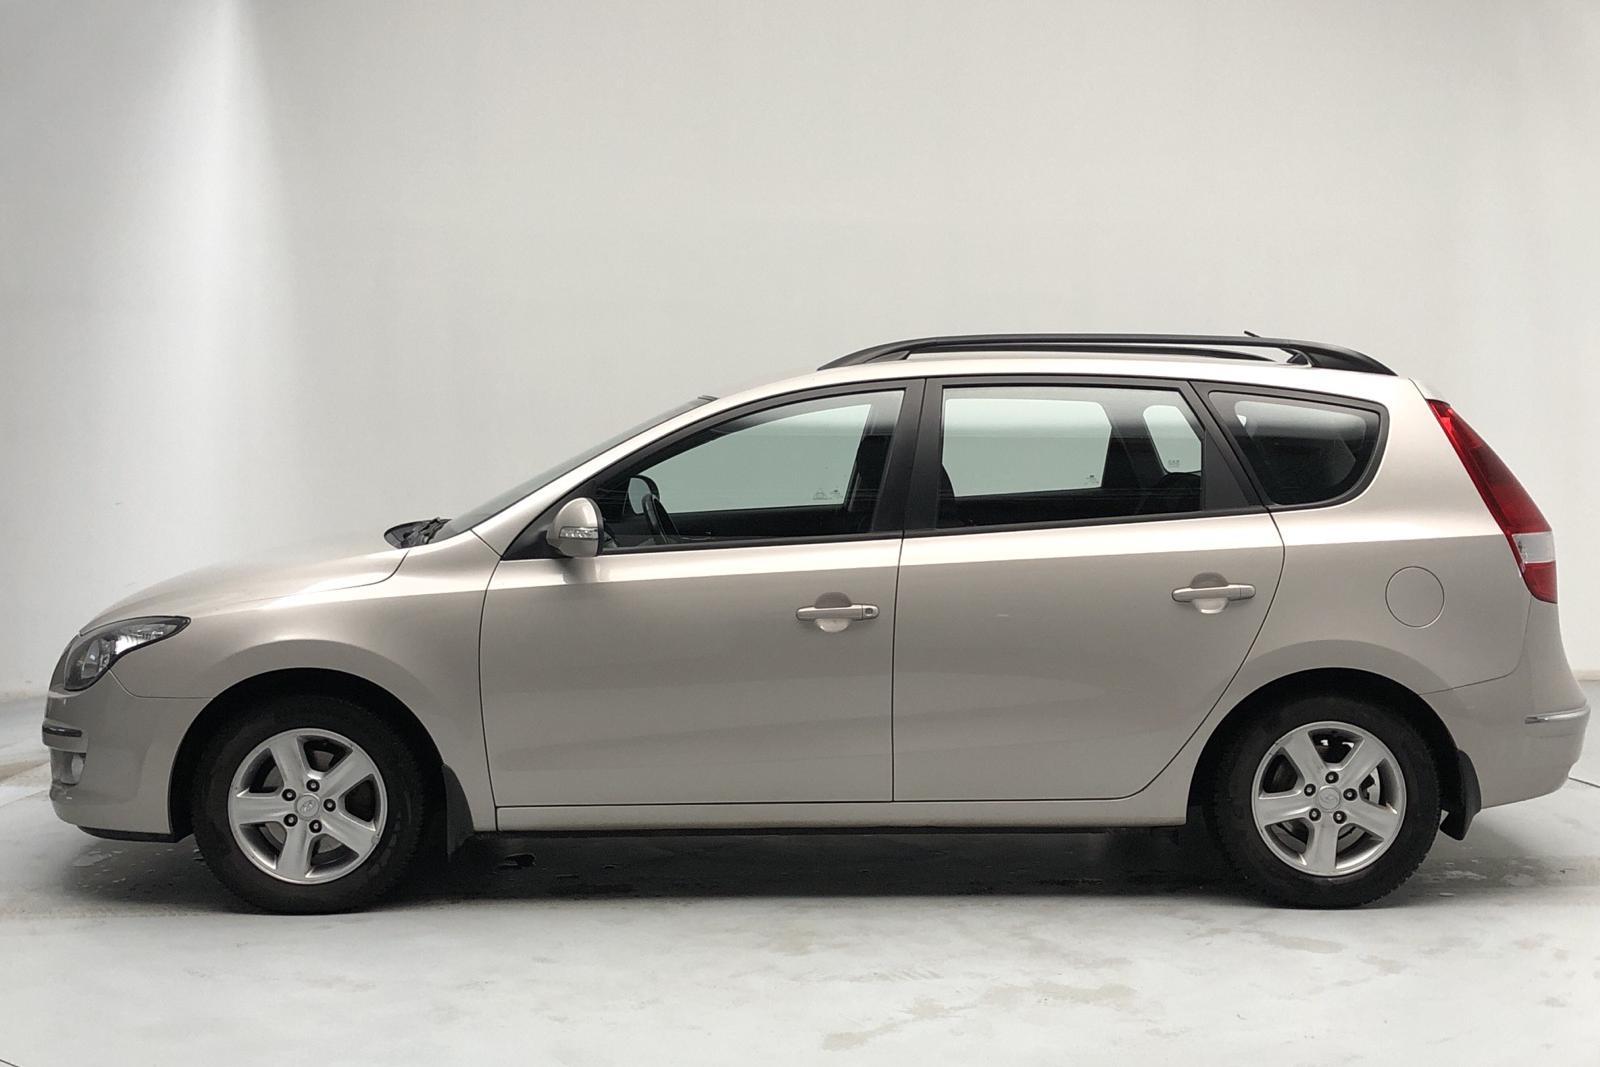 Hyundai i30 1.6 Kombi (122hk) - 149 210 km - Manual - Light Brown - 2010